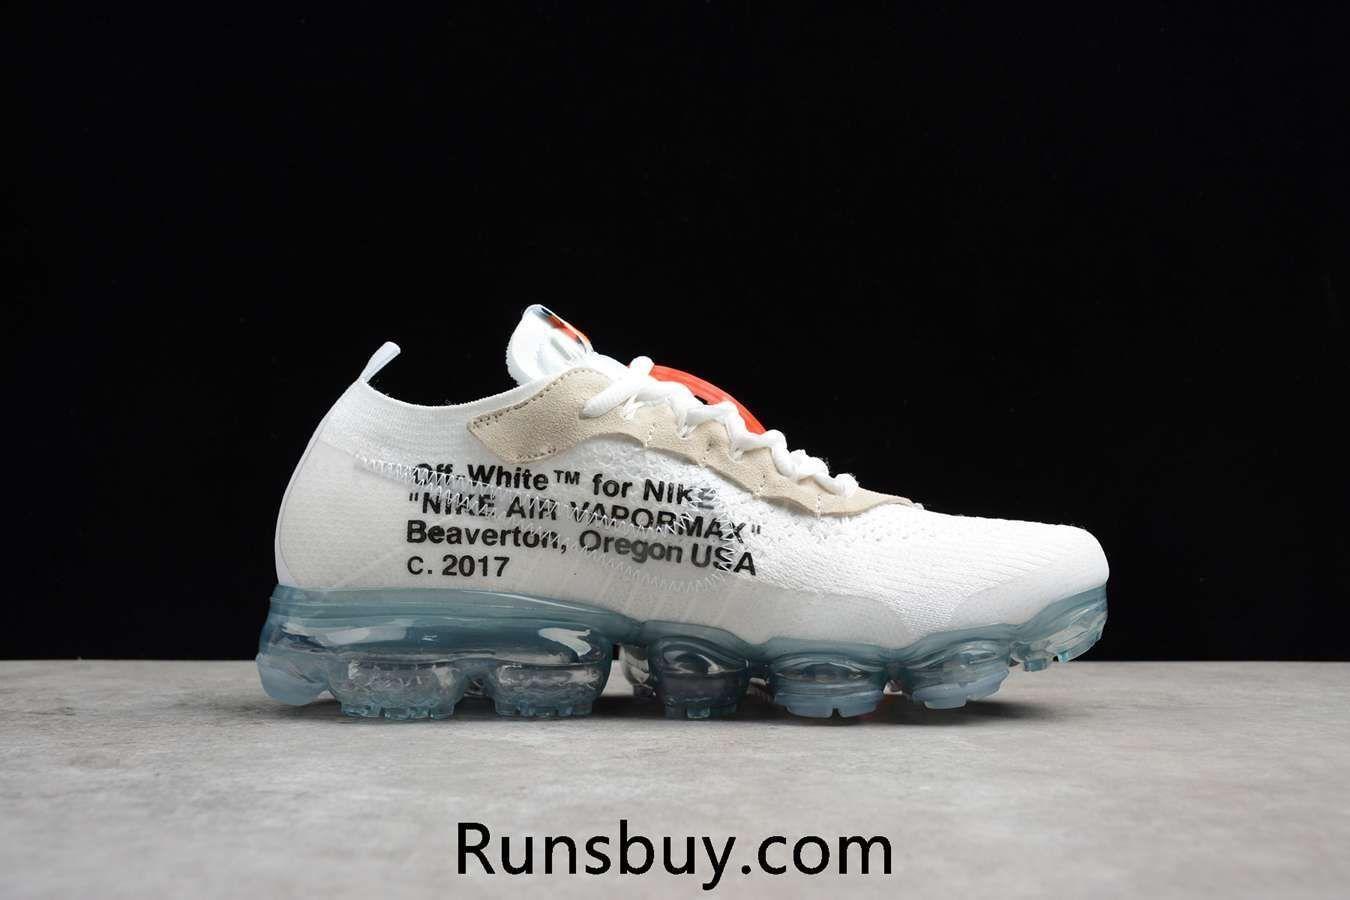 9c0e6d69211 OFF WHITE x Nike Air VaporMax 2018 OW Flyknit White Women Men Running Shoes  Nike